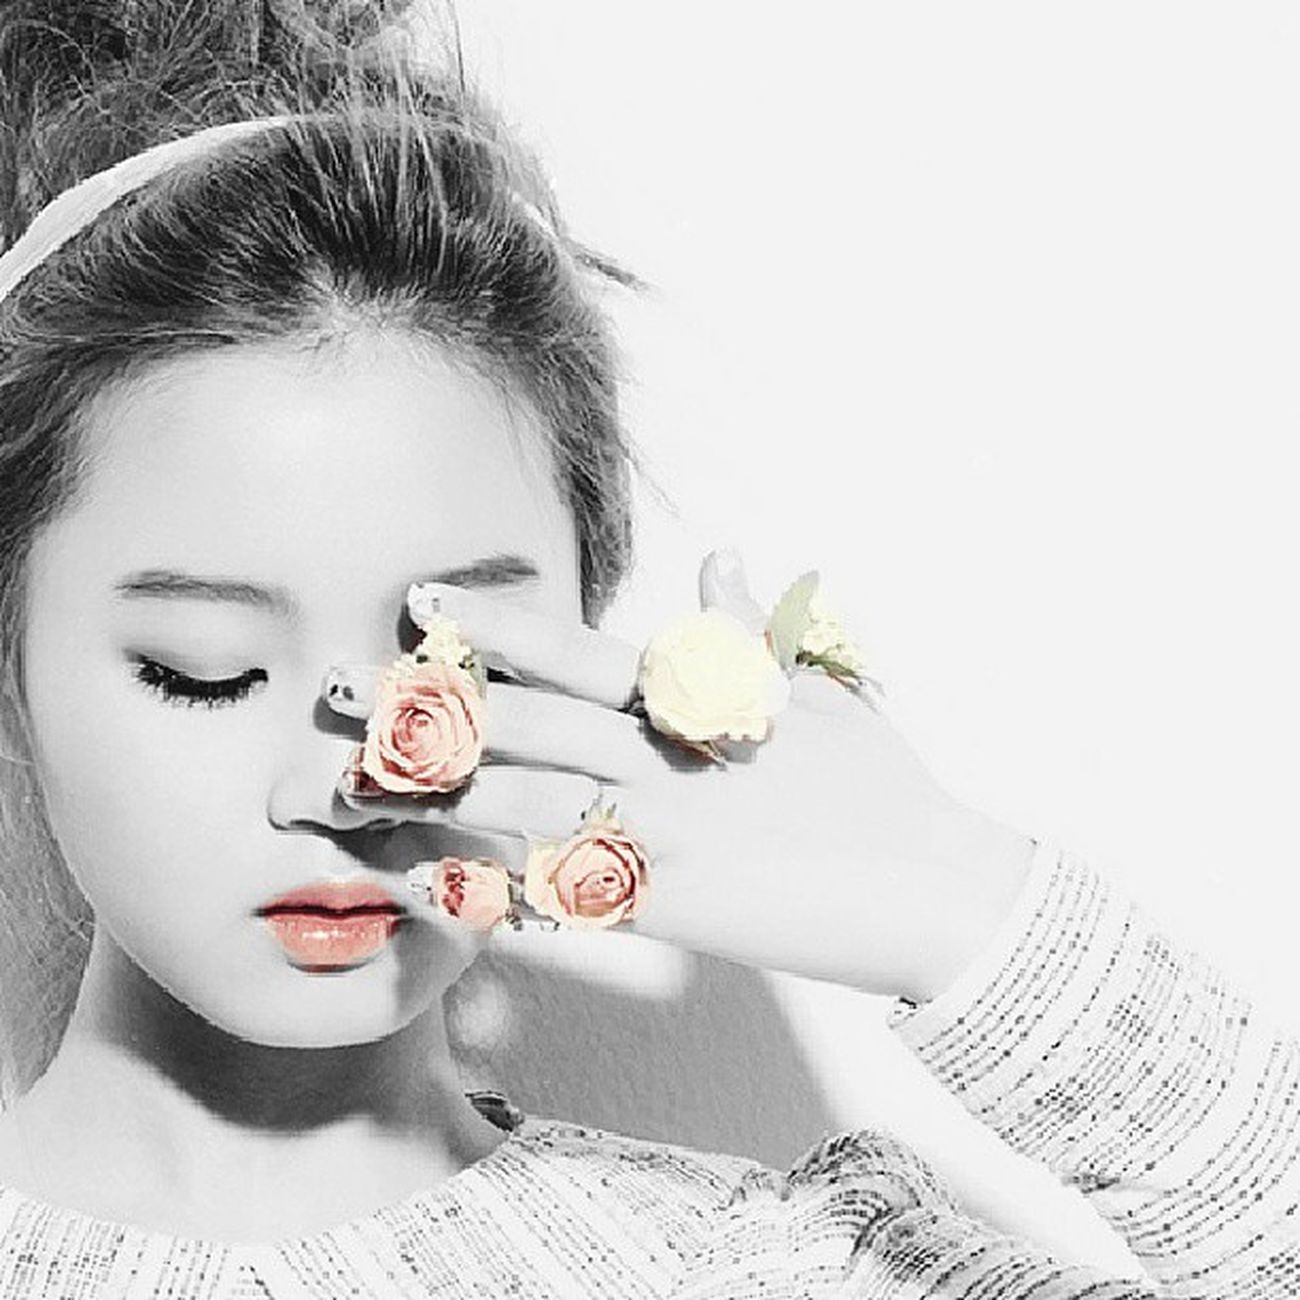 ~~Rose Rosemv Leehi Leehayi YGEntertainment kpopidol idol kpopstar korean <3